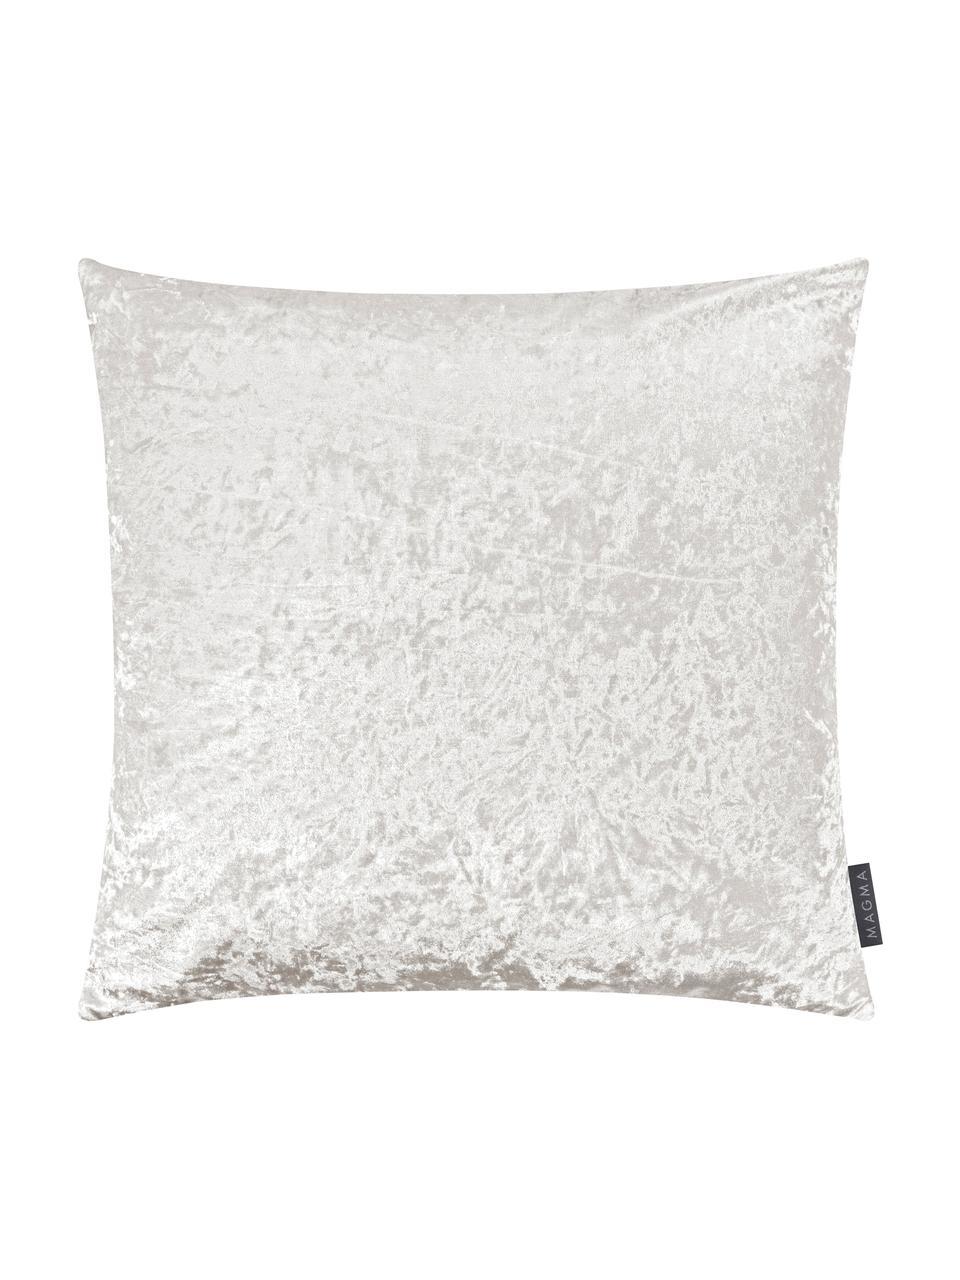 Fluwelen kussenhoes Shanta met glinsterende vintage patroon, 100% polyester fluweel, Ivoorkleurig, 40 x 40 cm